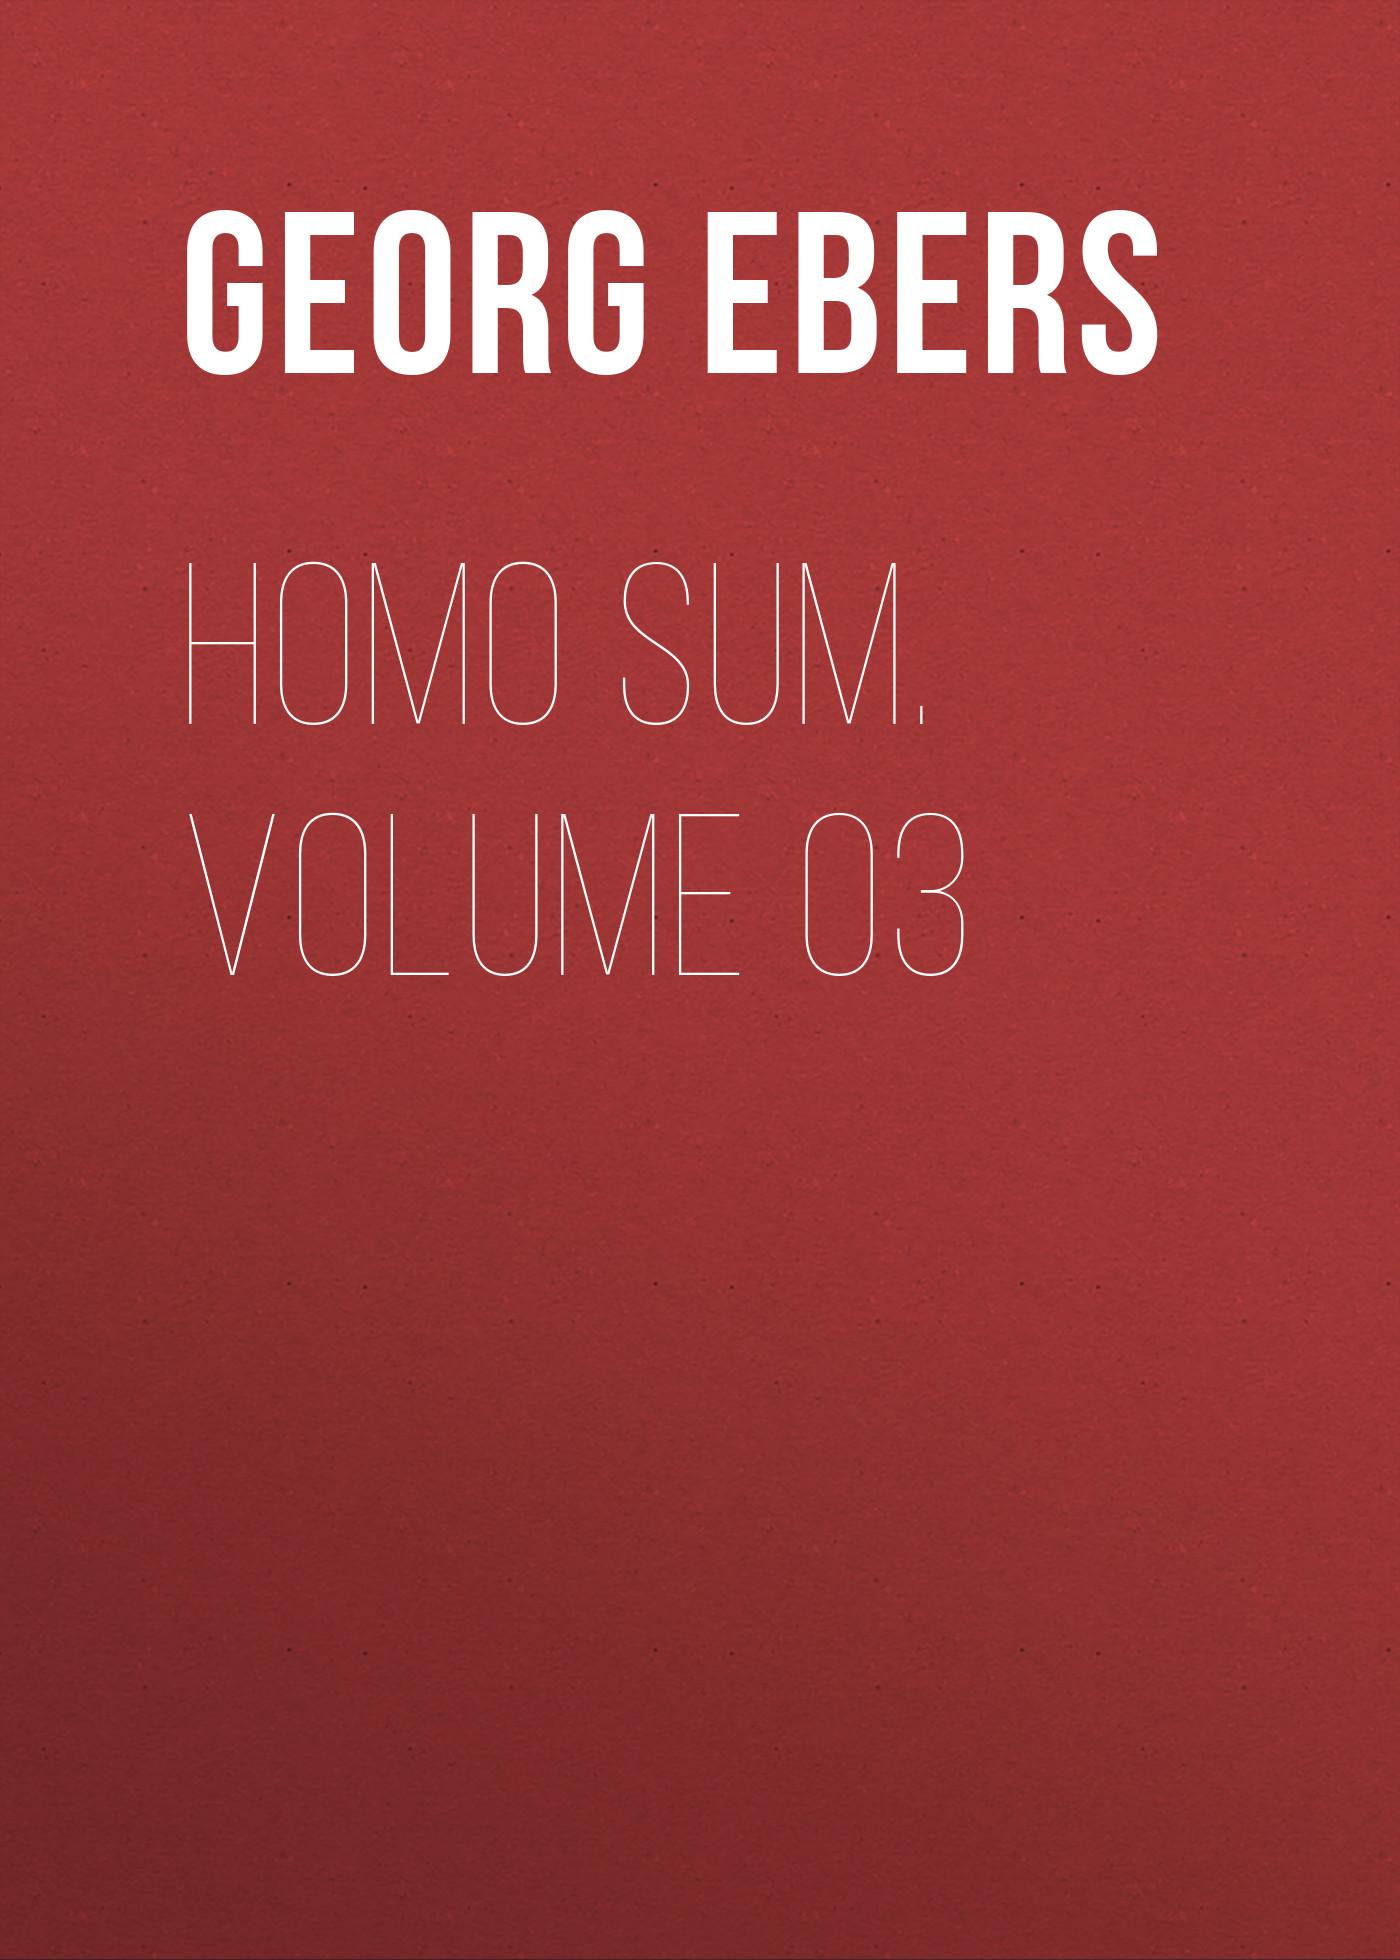 Georg Ebers Homo Sum. Volume 03 georg ebers homo sum volume 02